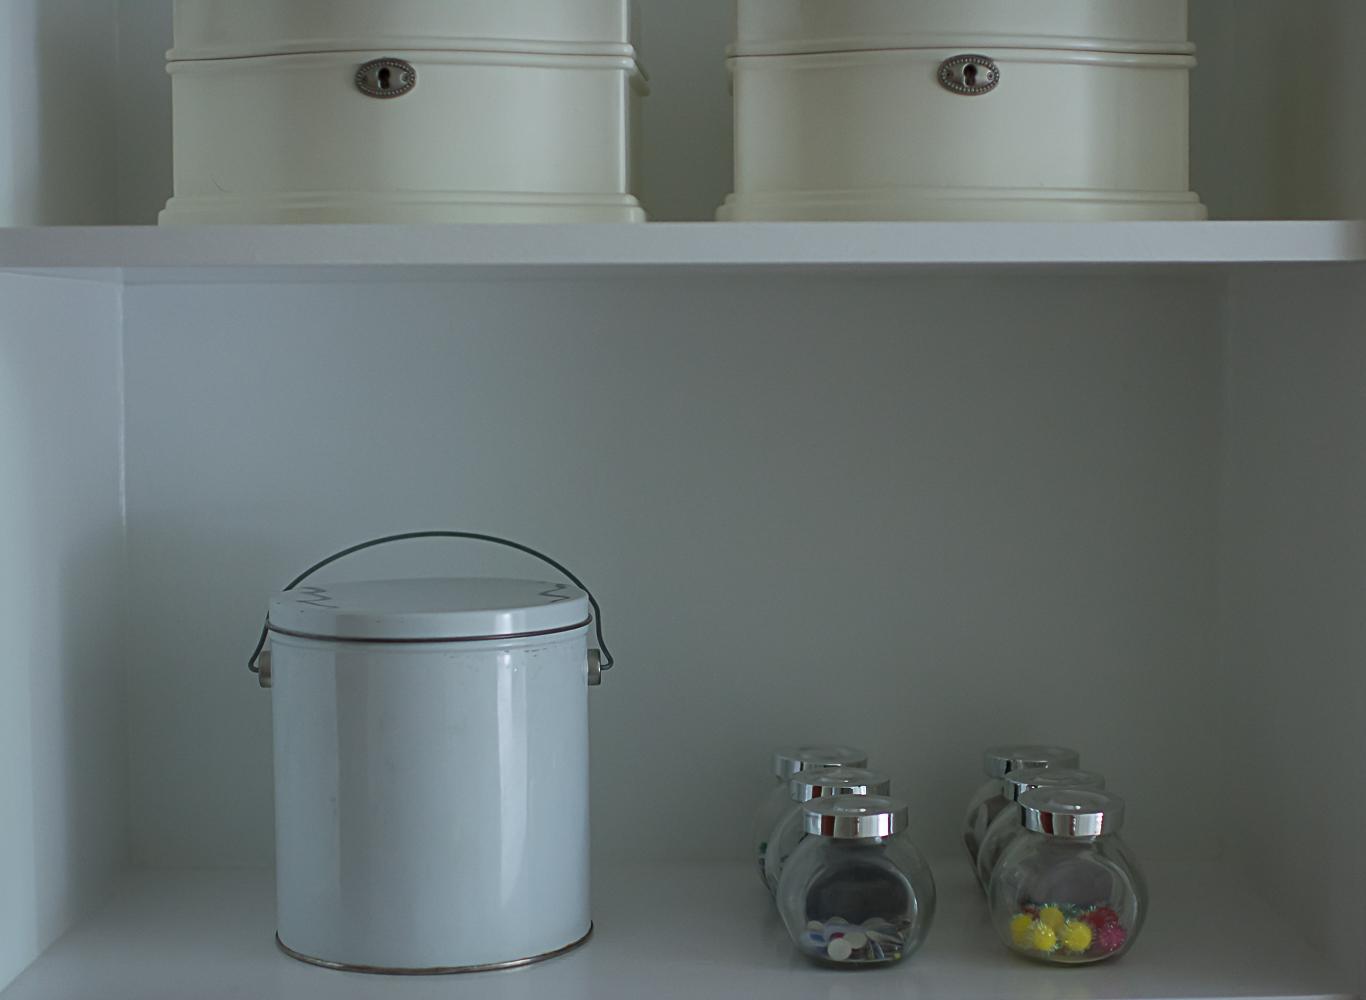 Toy Storage Jars and Buckets